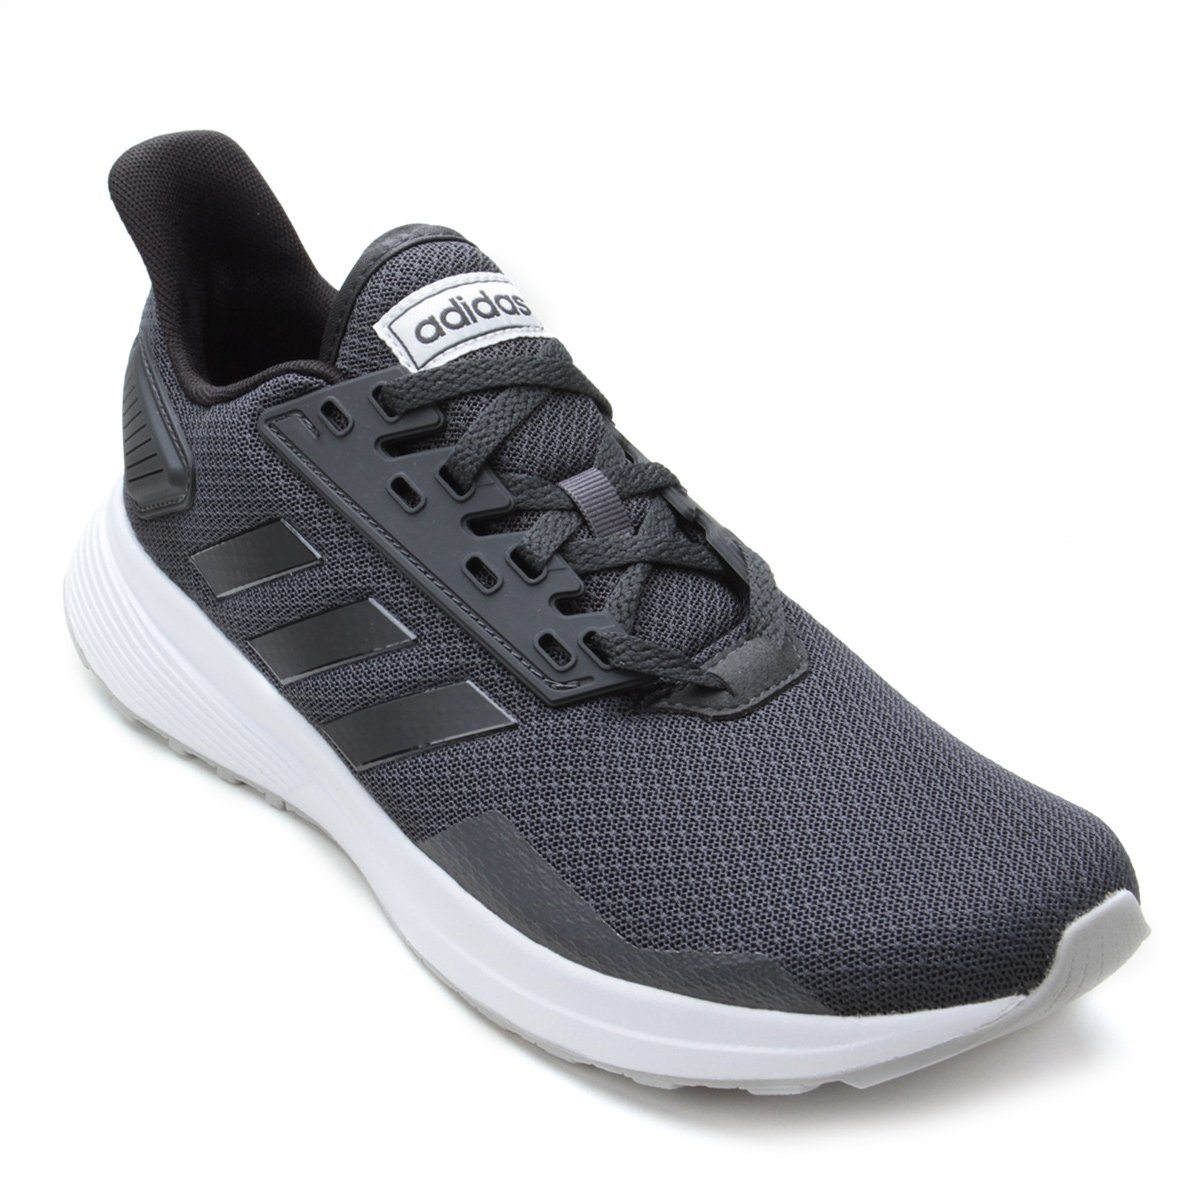 8ce53d0060 Tênis Adidas Duramo Adidas 9 Cinza e Masculino Tênis Preto 4qa4xw7r ...